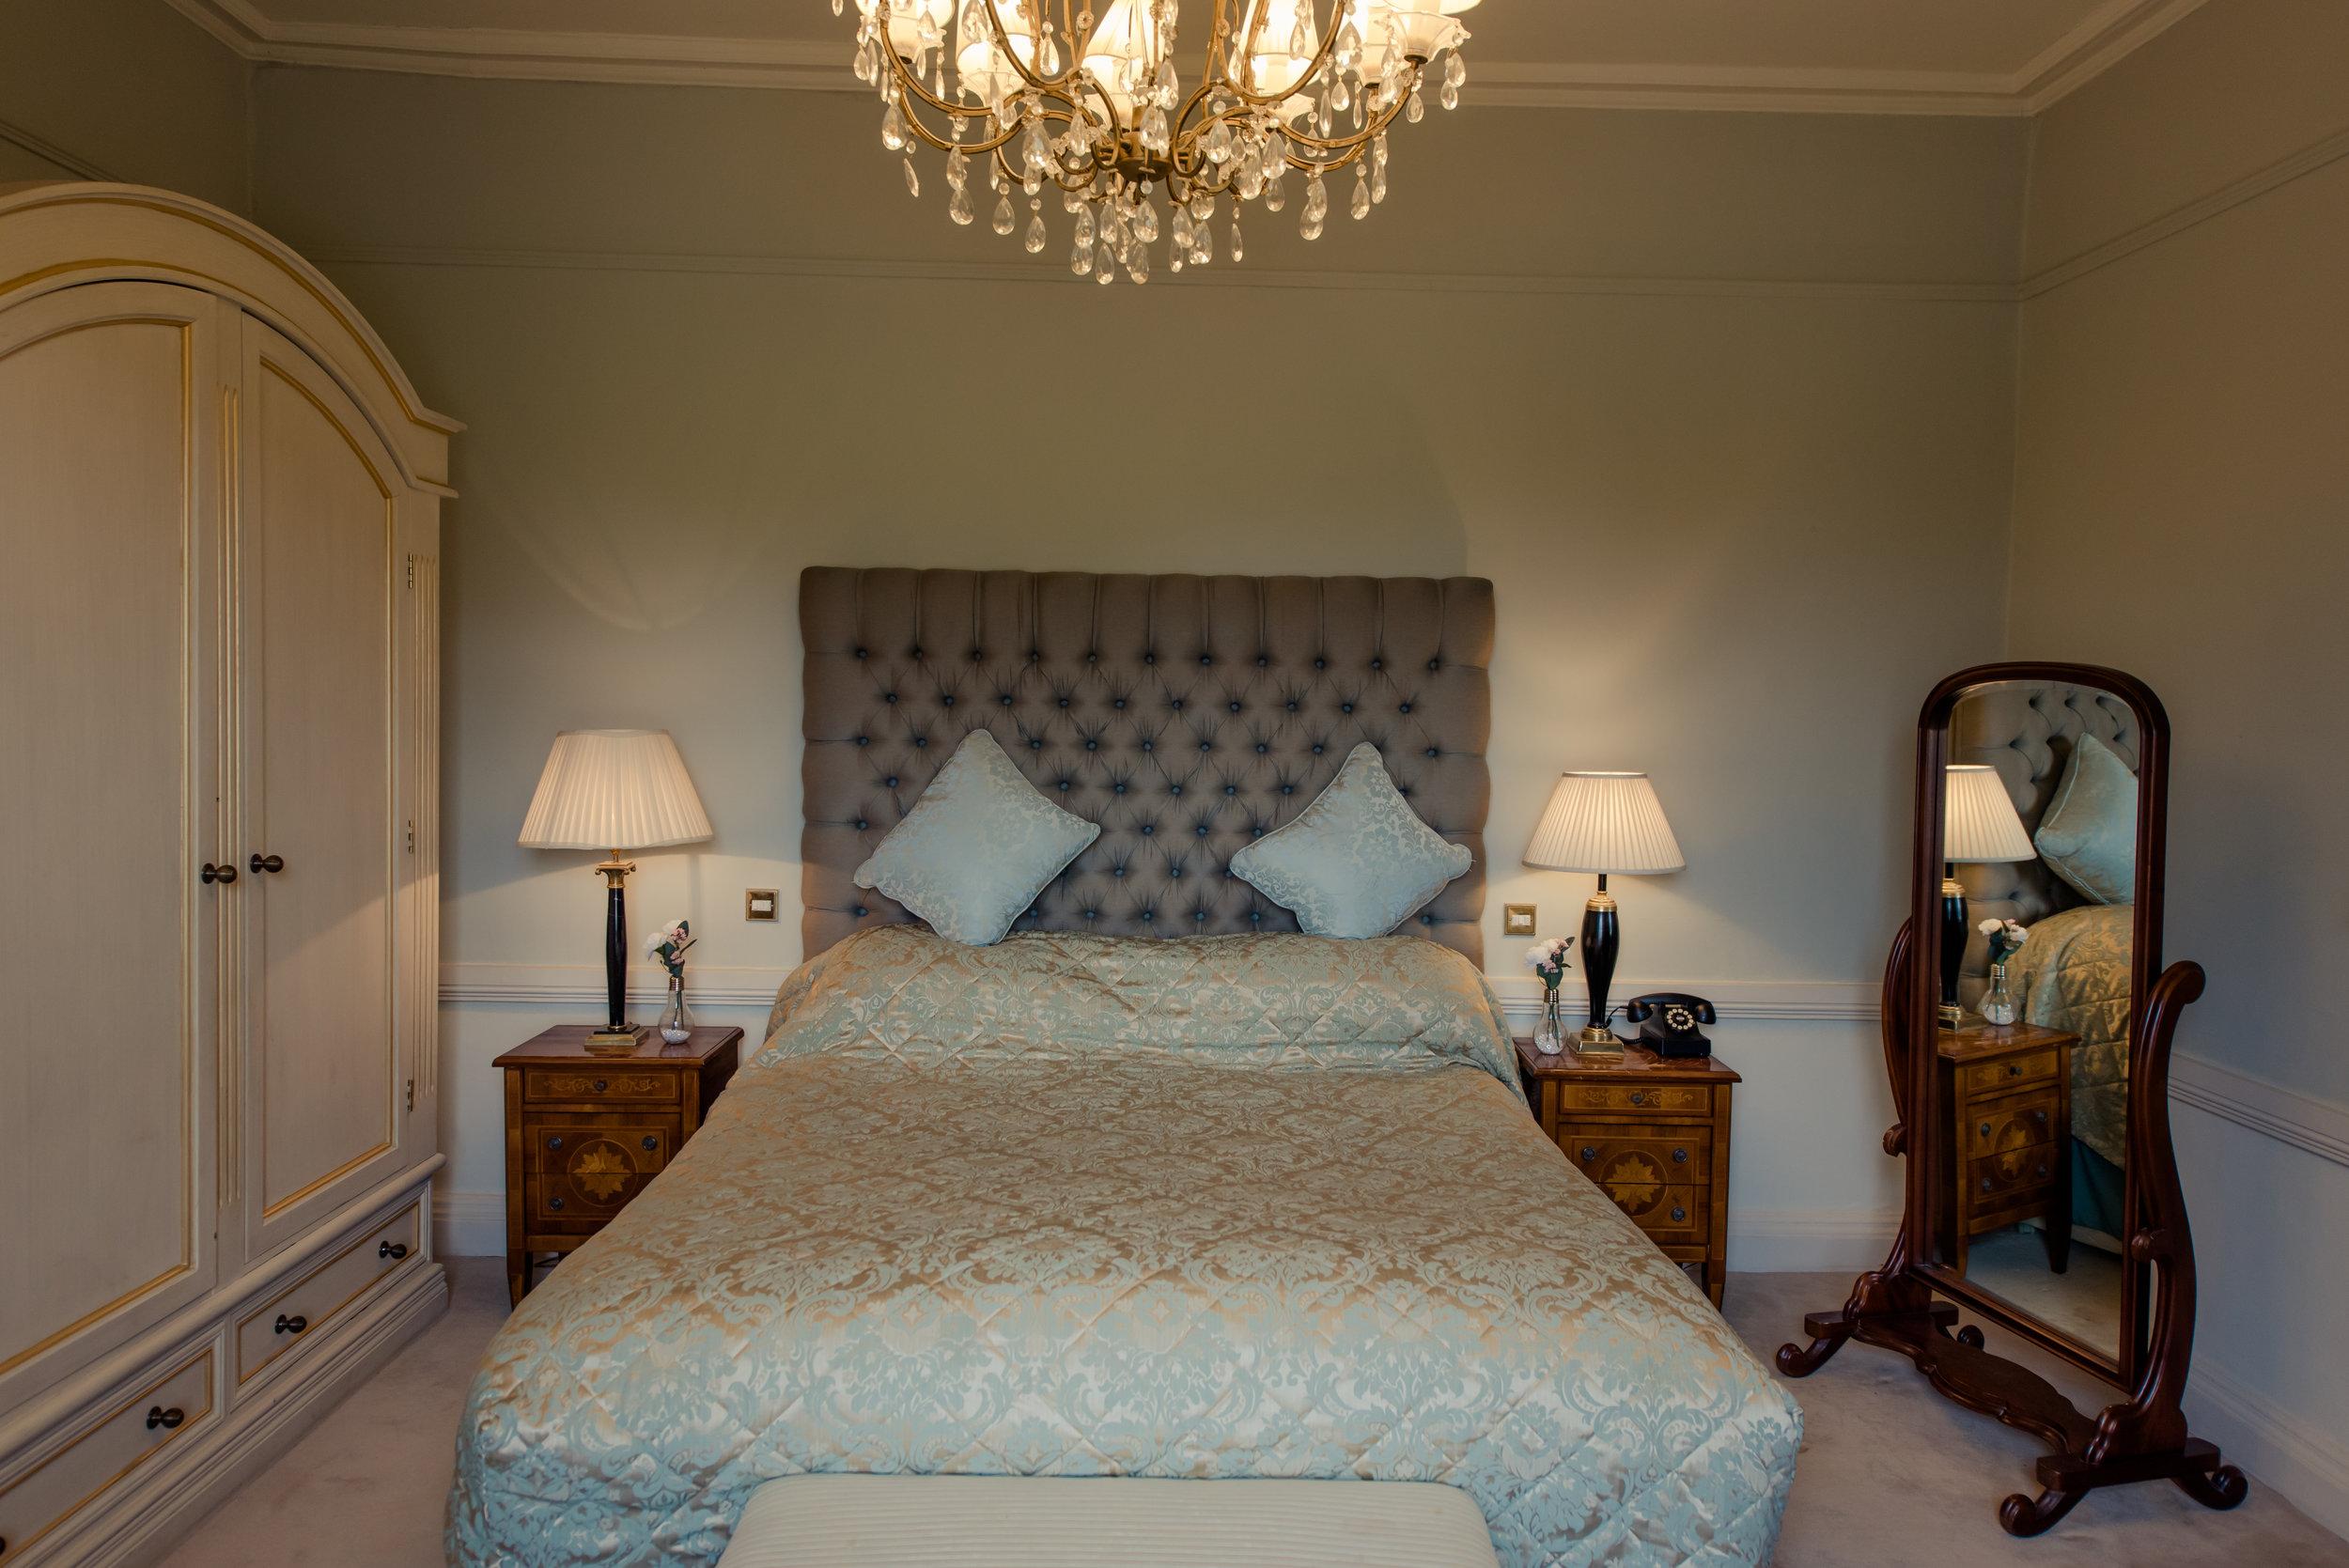 Tulfarris Hotel & Golf Resort Manor House bedroom with large wardrobe.jpg